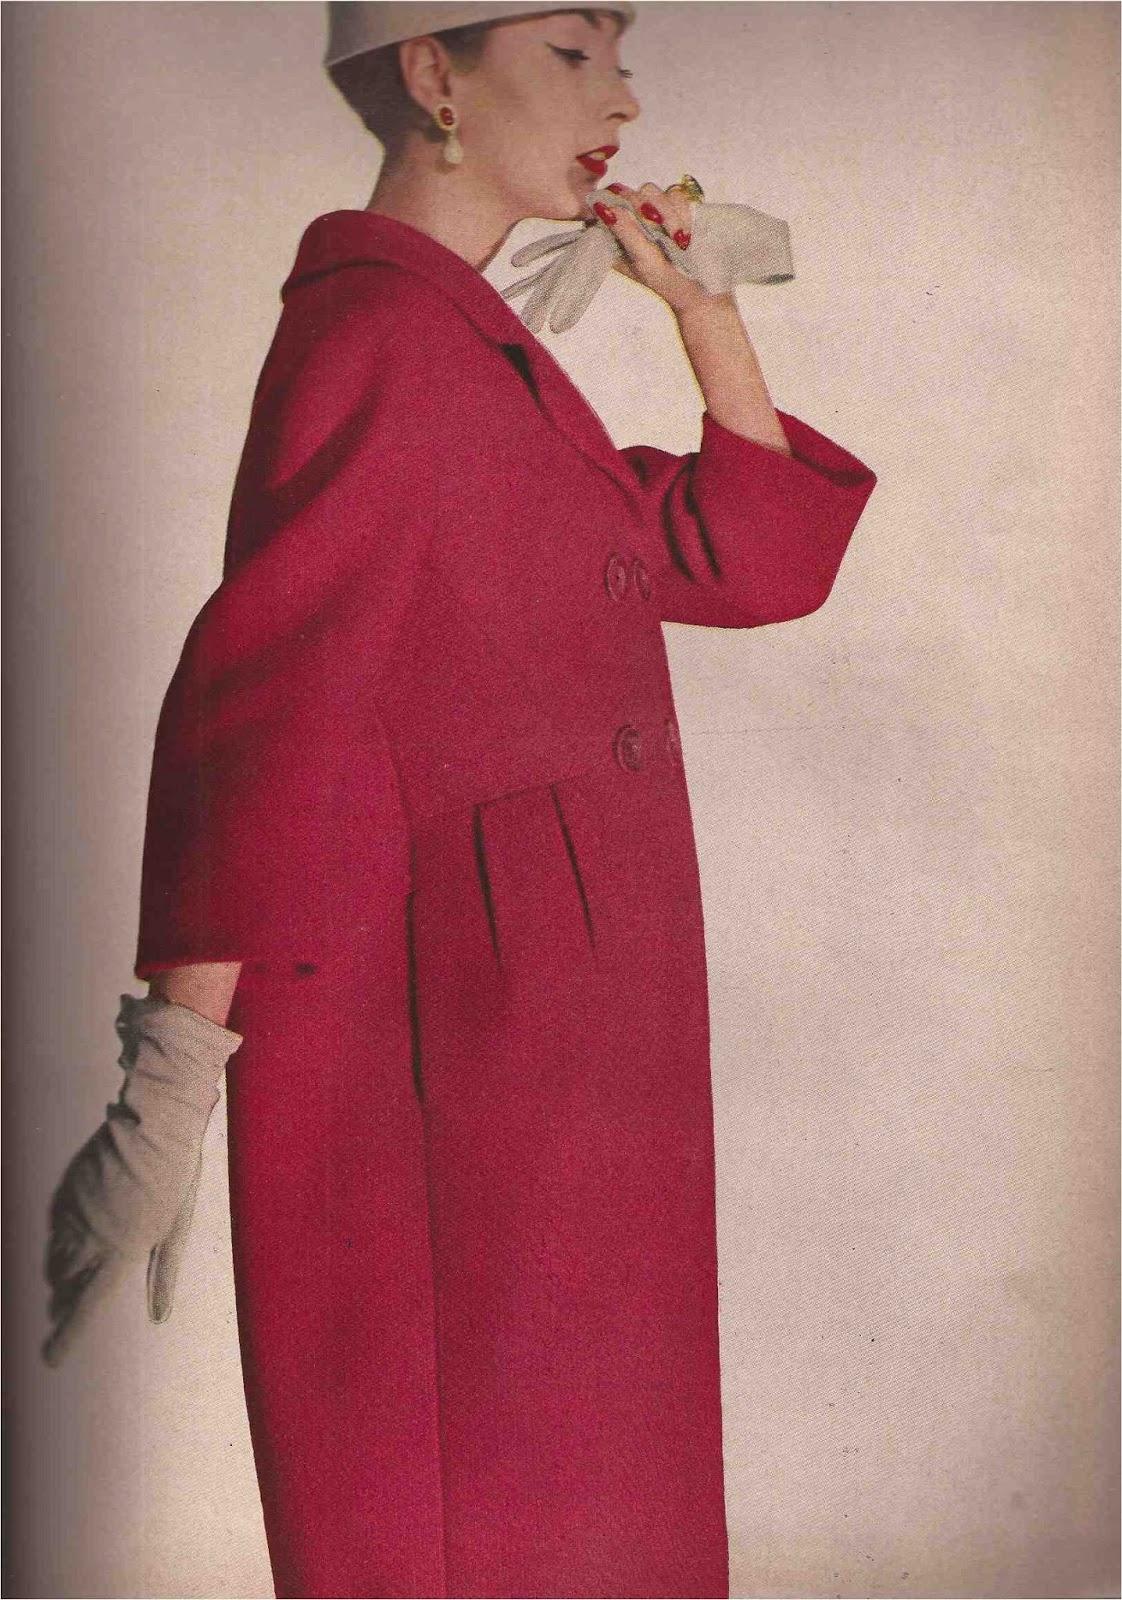 Revlon Orange Flip devodotcom: '58 WAS GR...